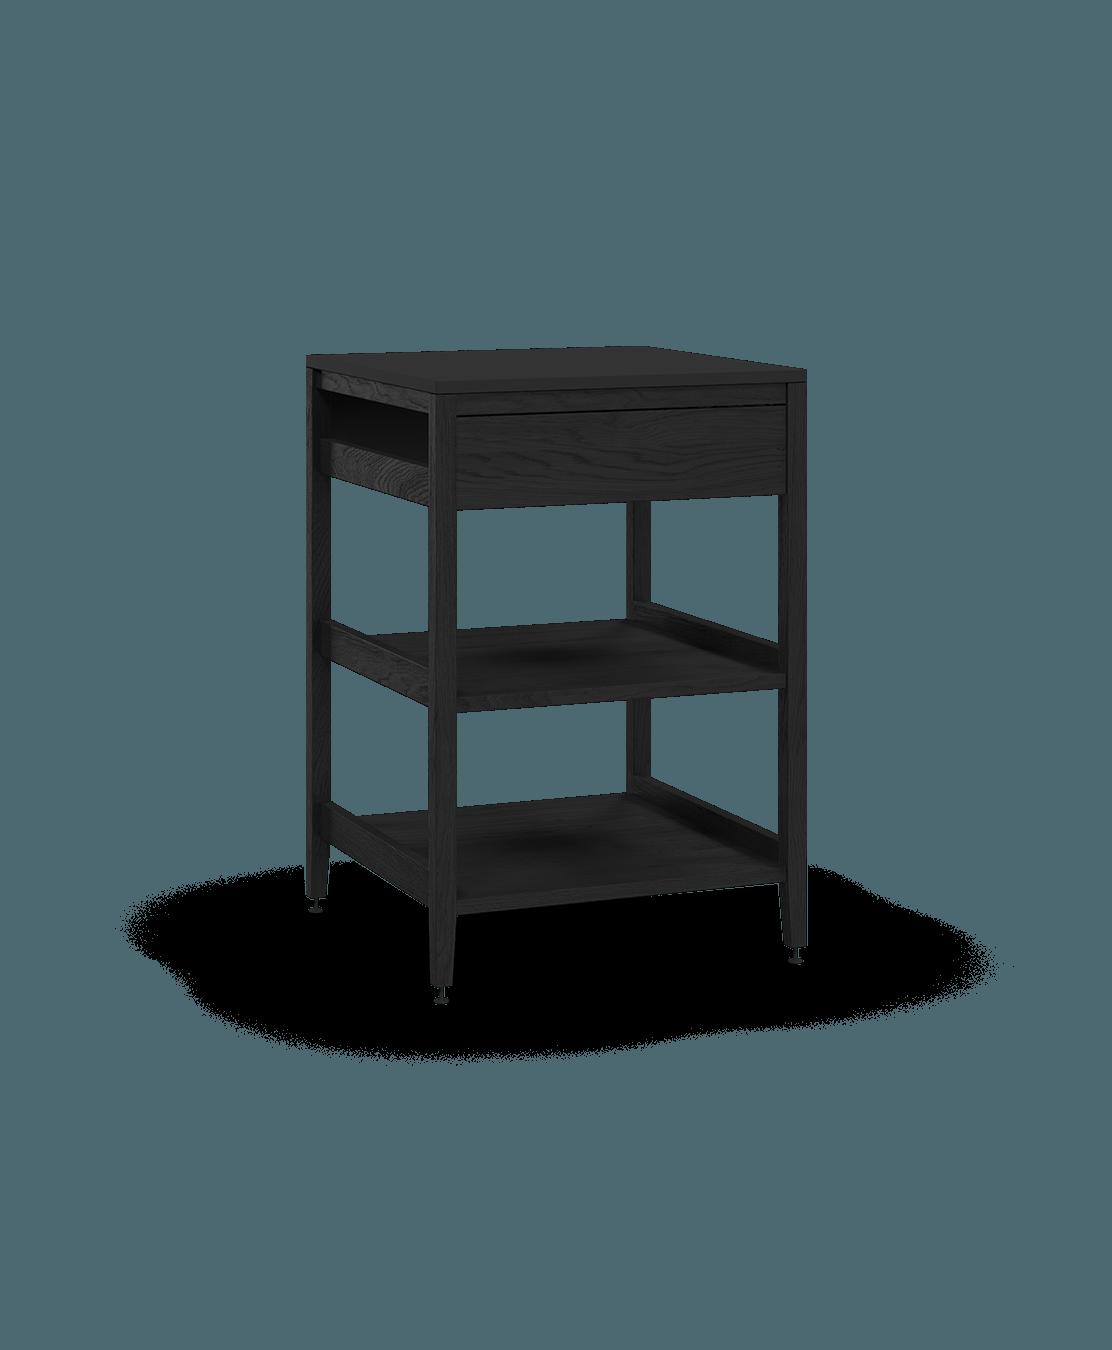 coquo radix midnight black stained oak solid wood modular 2 wood shelves false front base corner kitchen cabinet 24 inch C1-CC-24SBW-002W2-BK